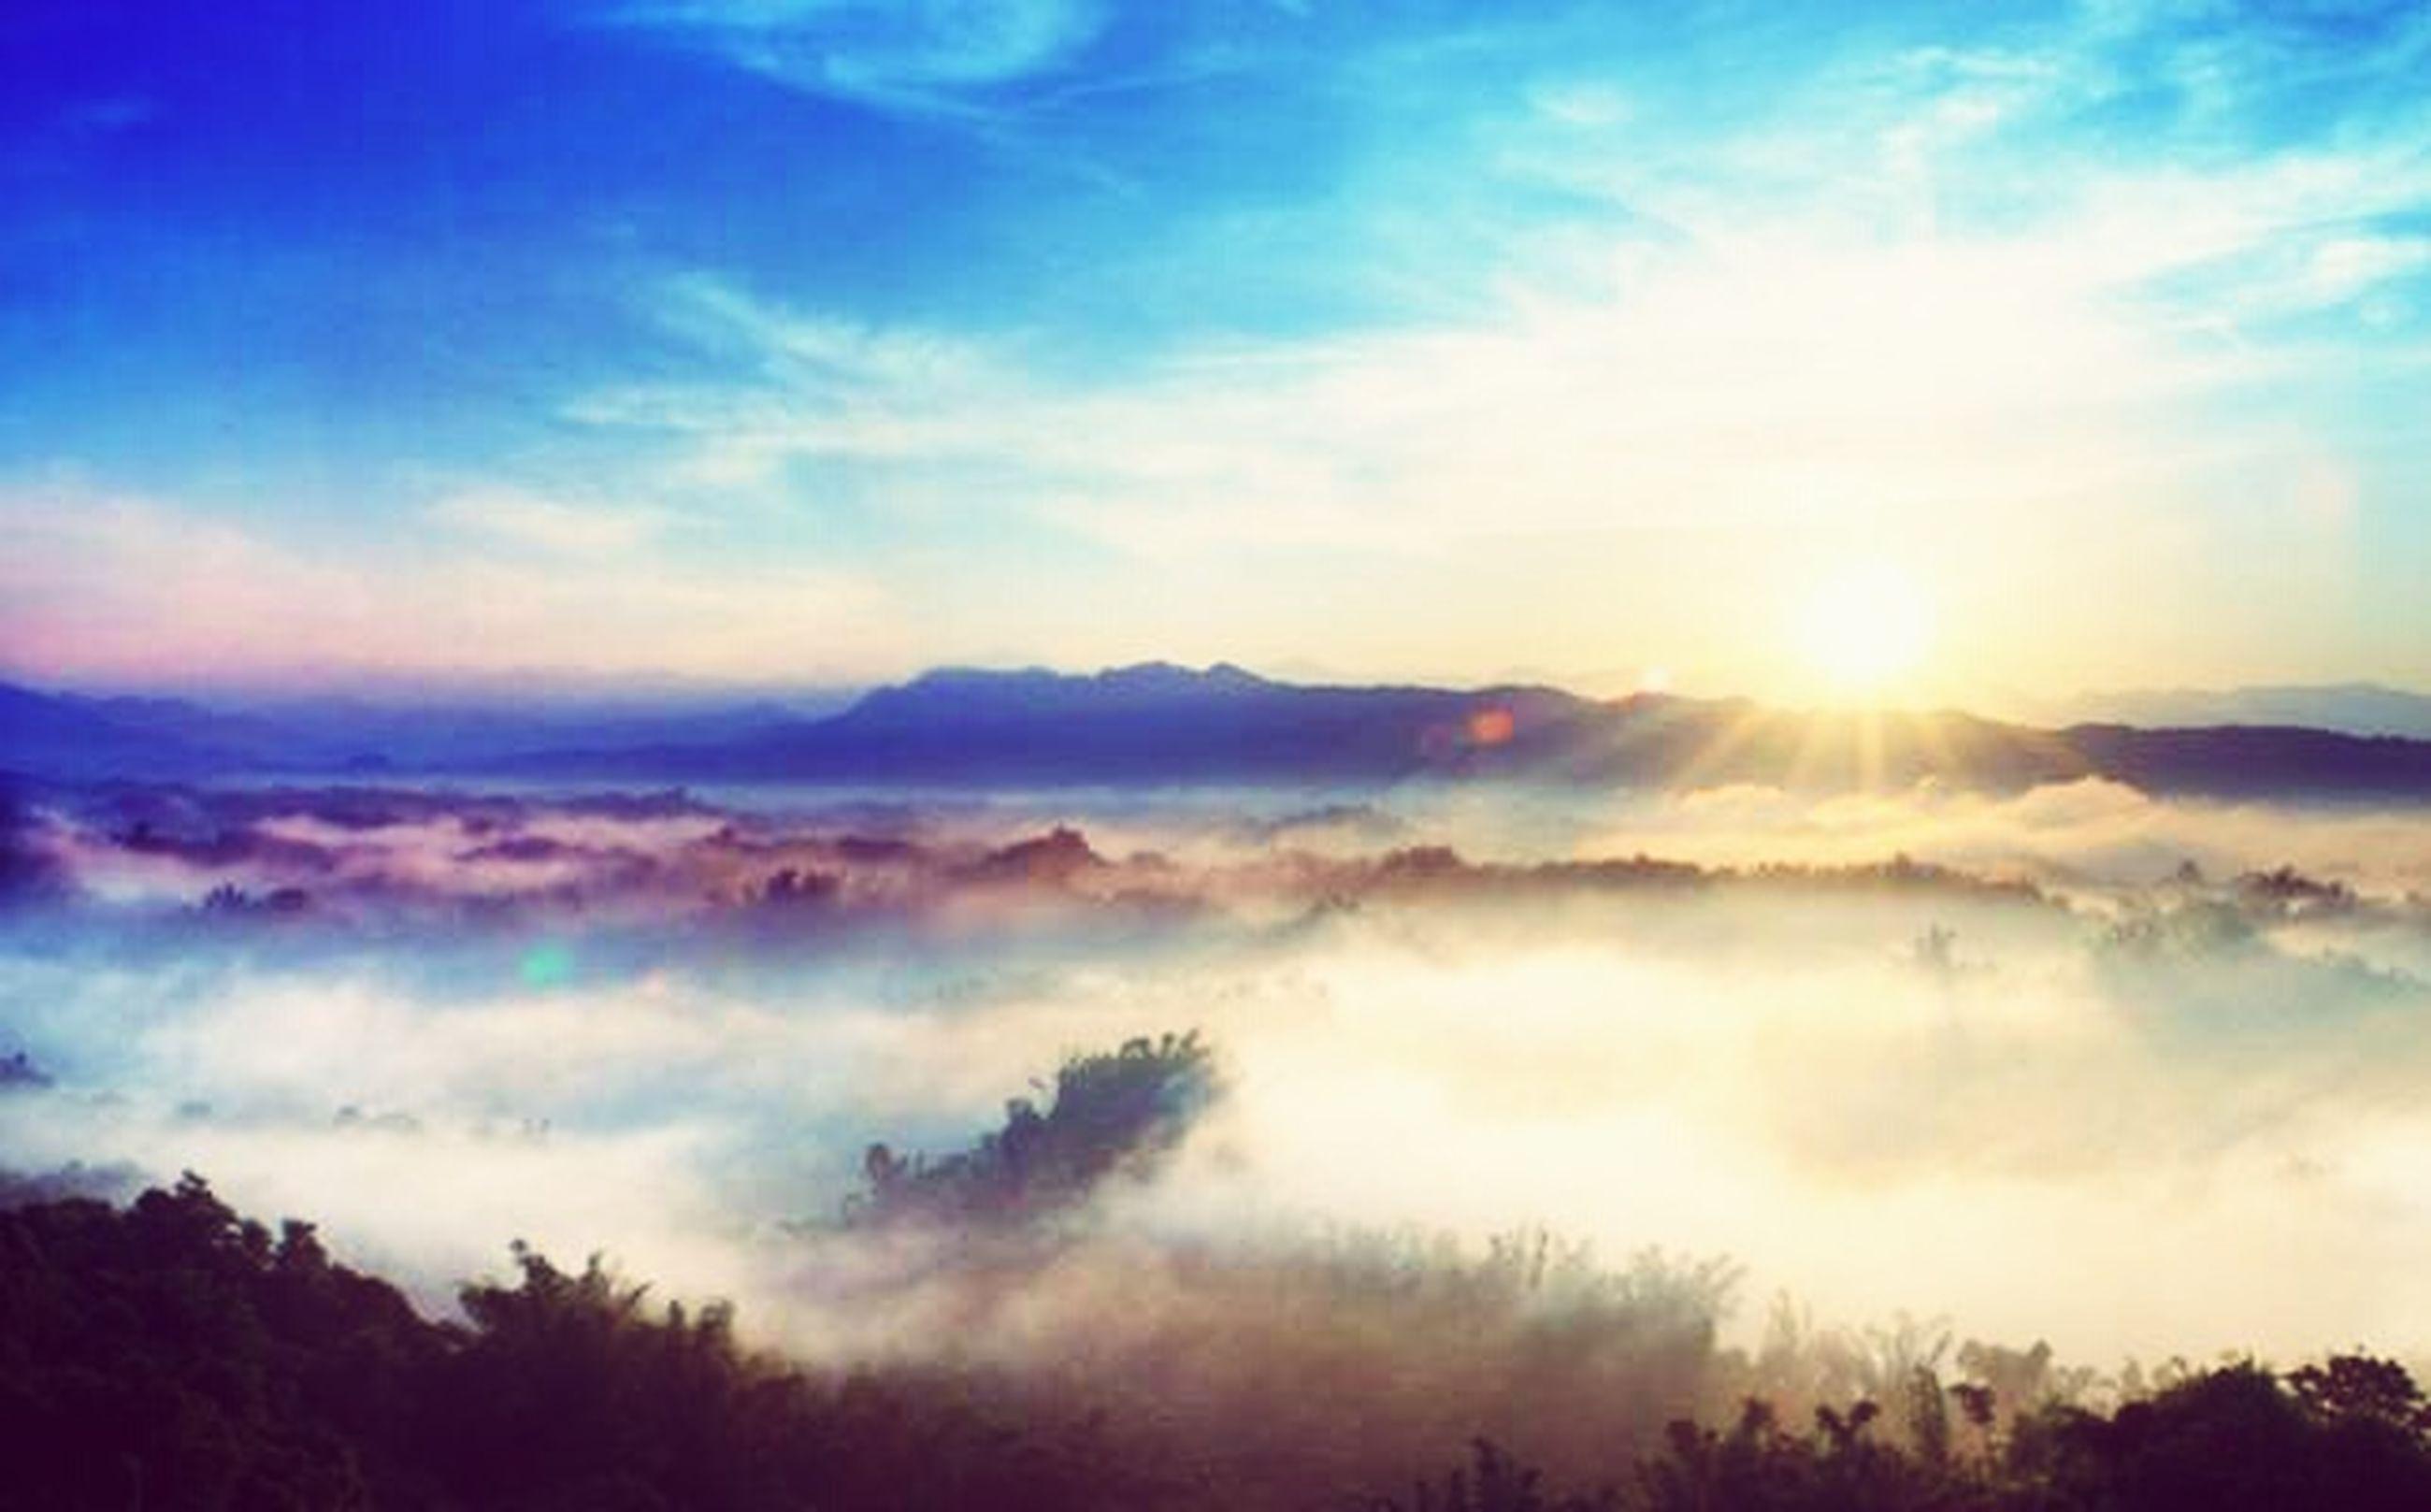 scenics, tranquil scene, beauty in nature, tranquility, mountain, sky, cloud - sky, nature, sunbeam, mountain range, sun, landscape, sunlight, idyllic, cloud, majestic, non-urban scene, weather, outdoors, no people